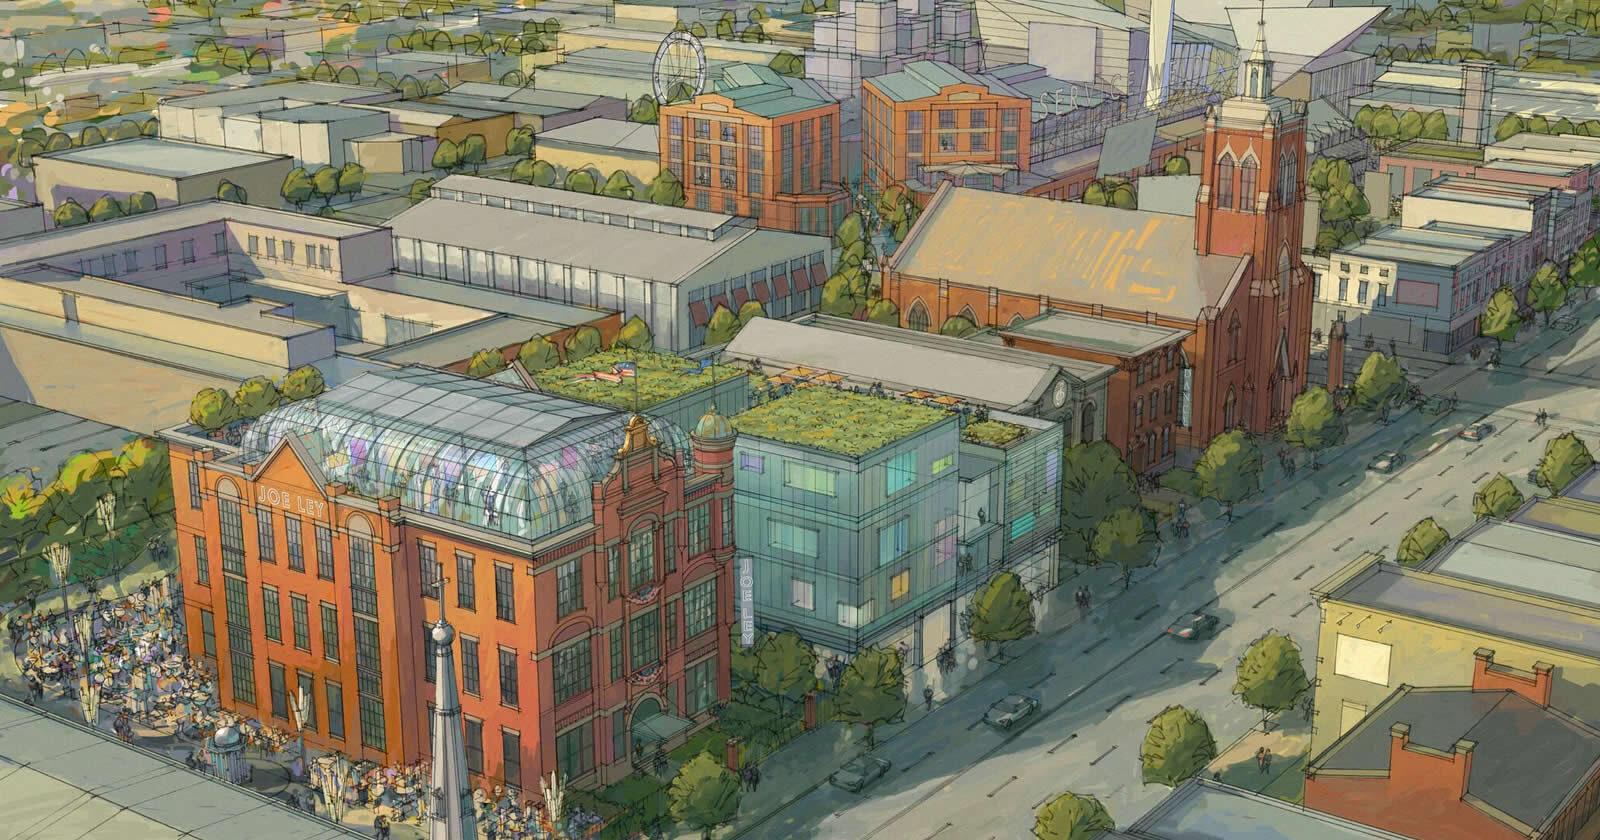 Reviving Freeze-Dried Urban Neighborhoods